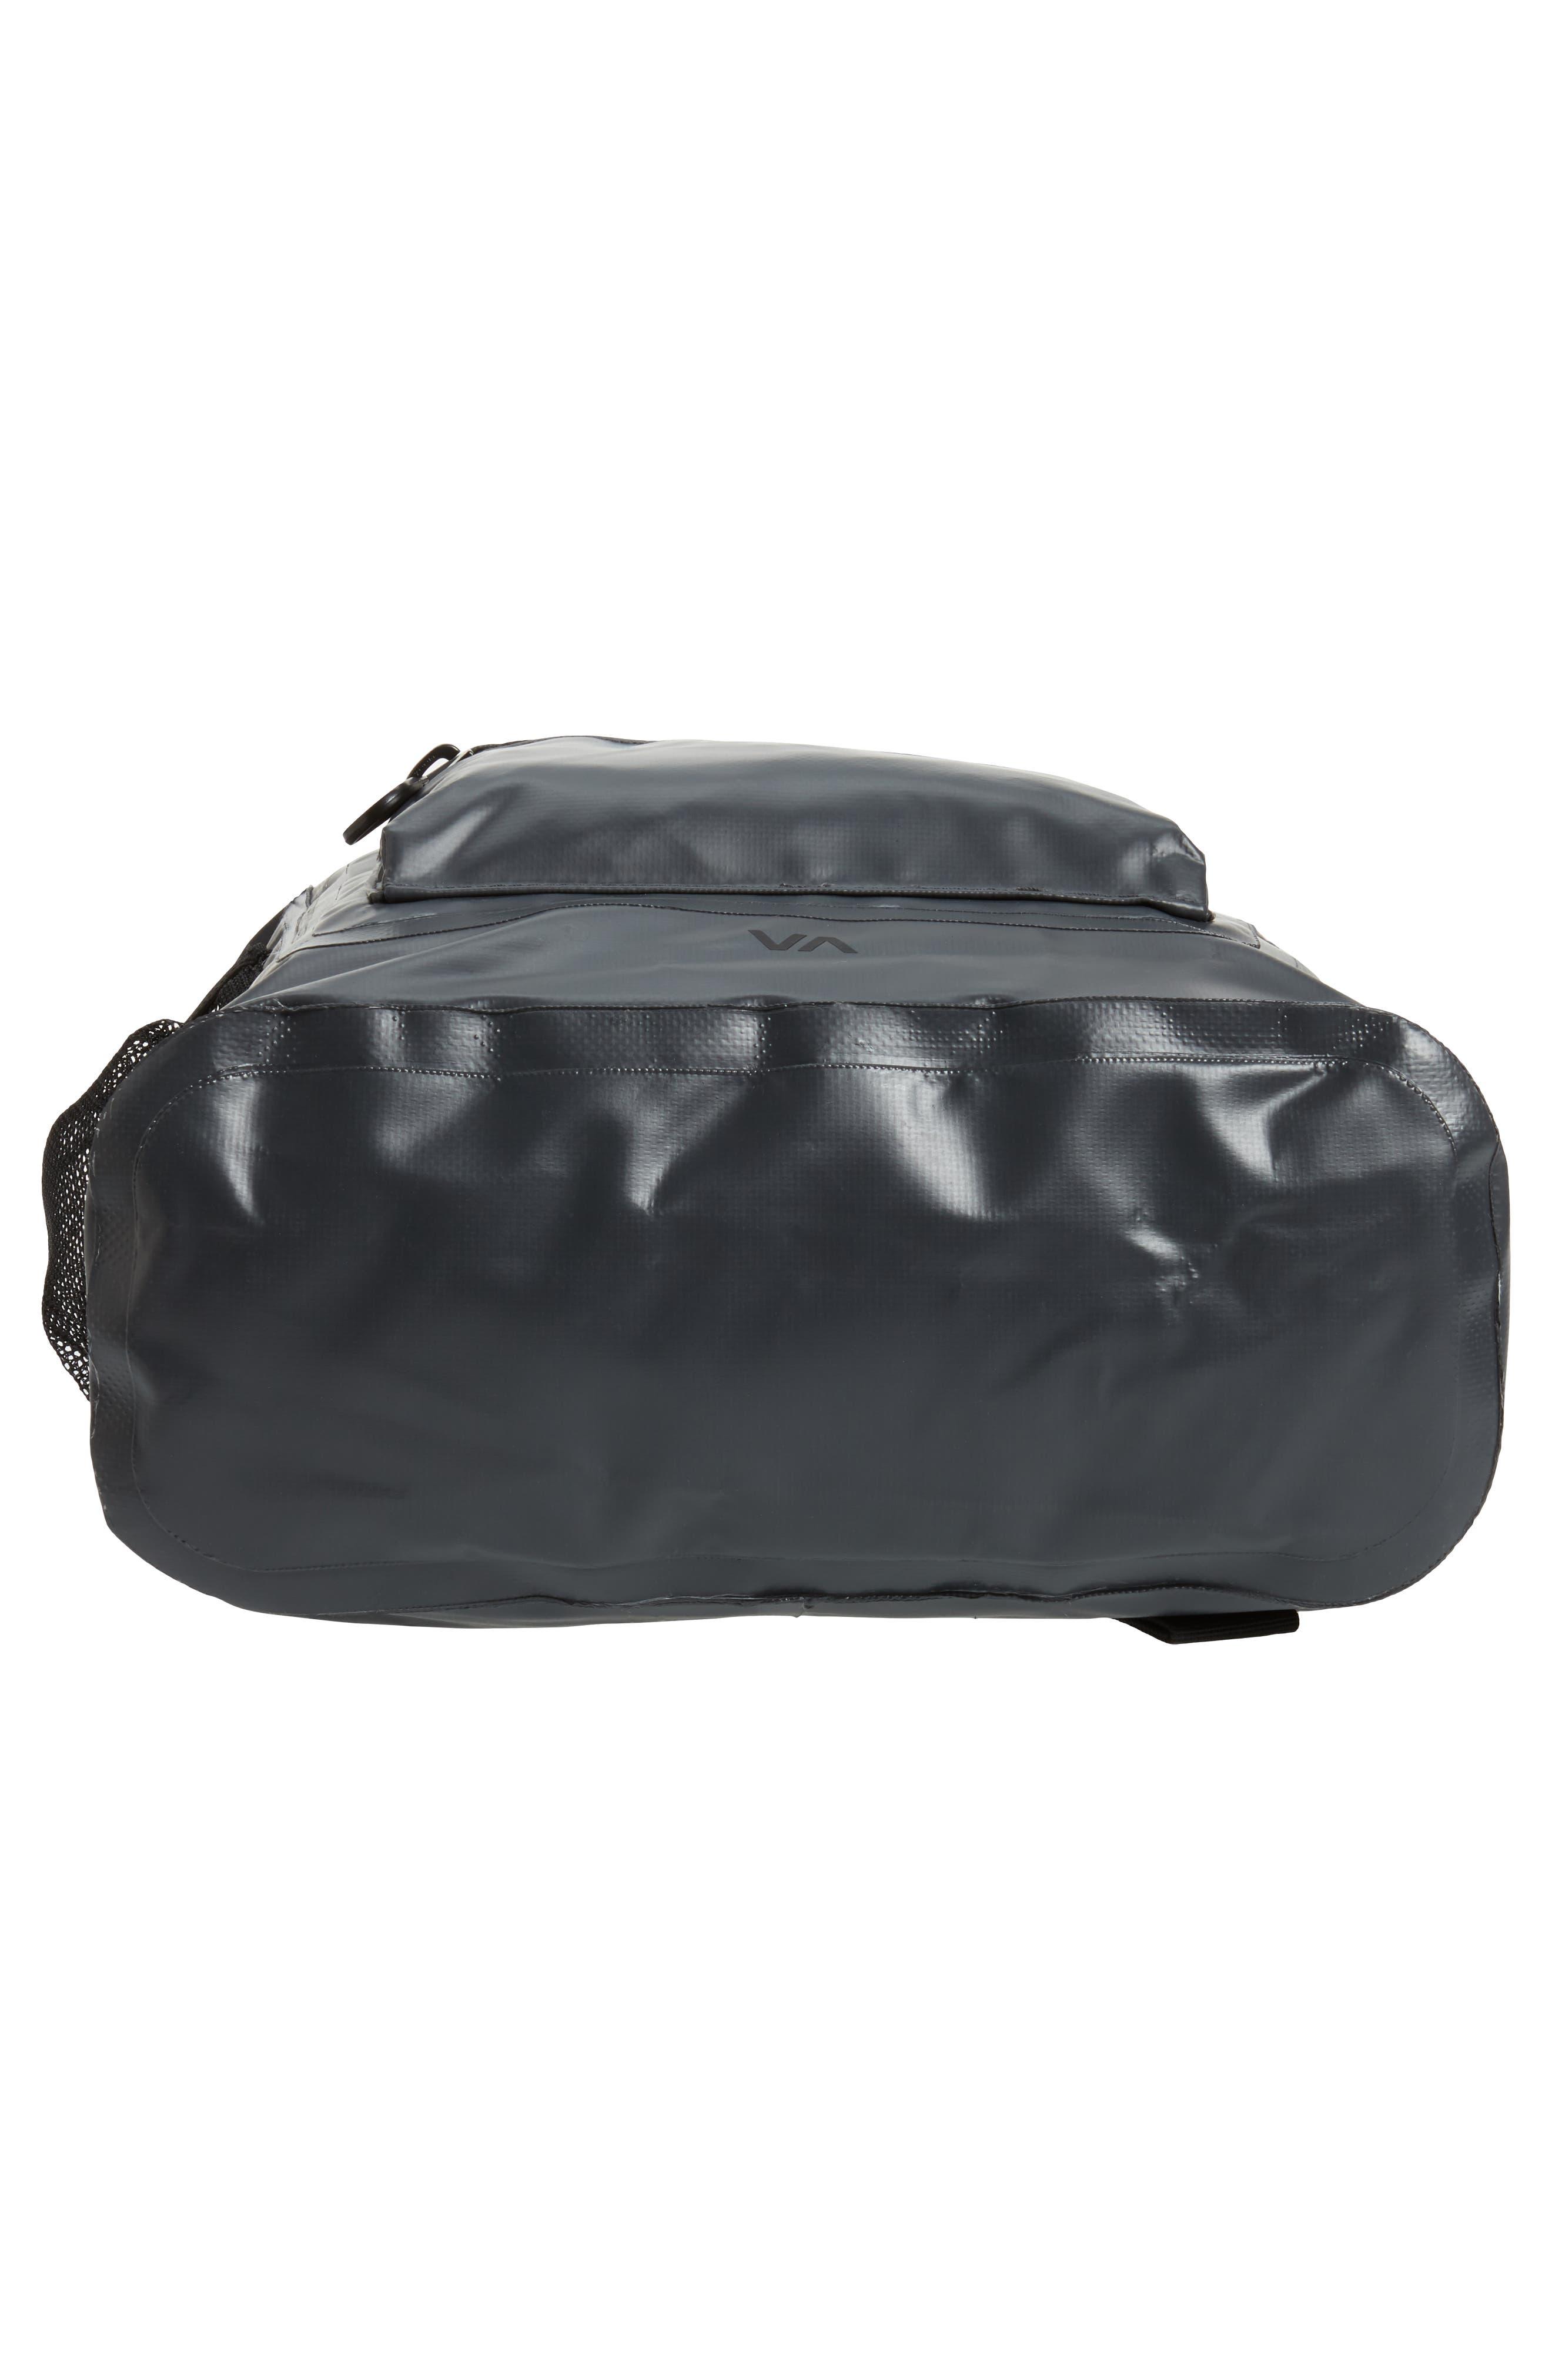 Go Be II Waterproof Backpack,                             Alternate thumbnail 6, color,                             Charcoal